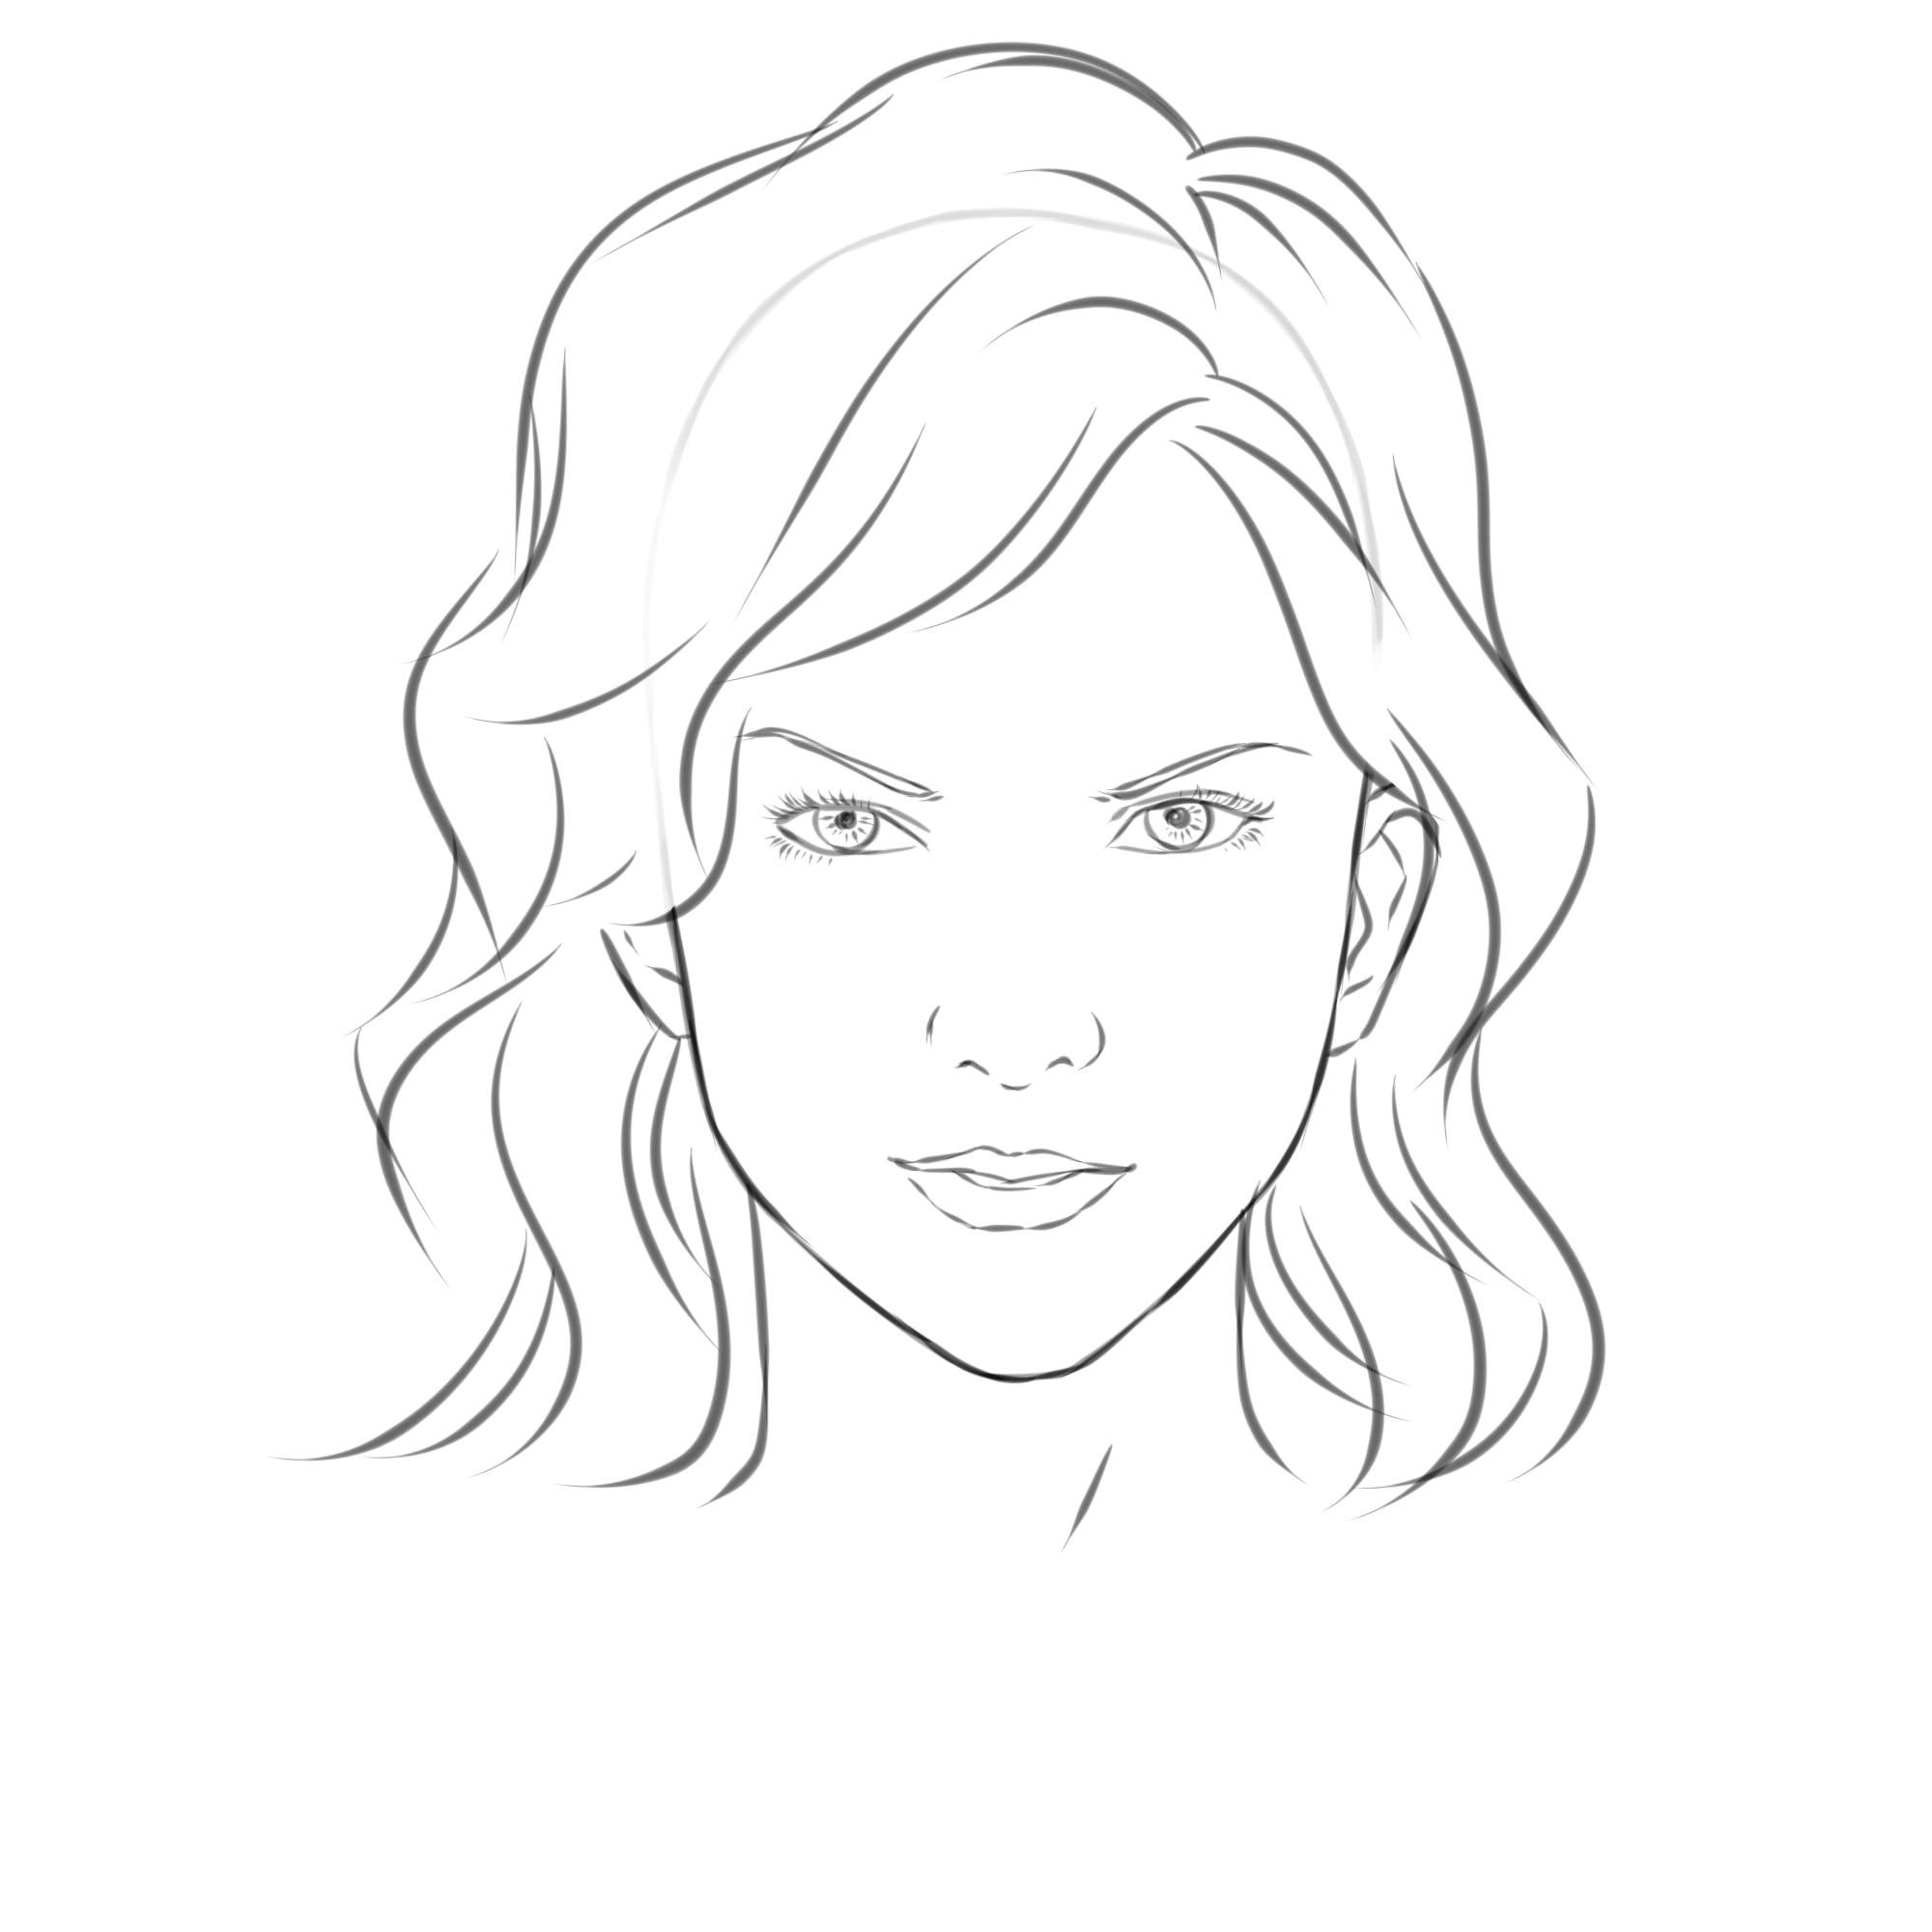 2000x2000 Easy Sketch Face Of Girl